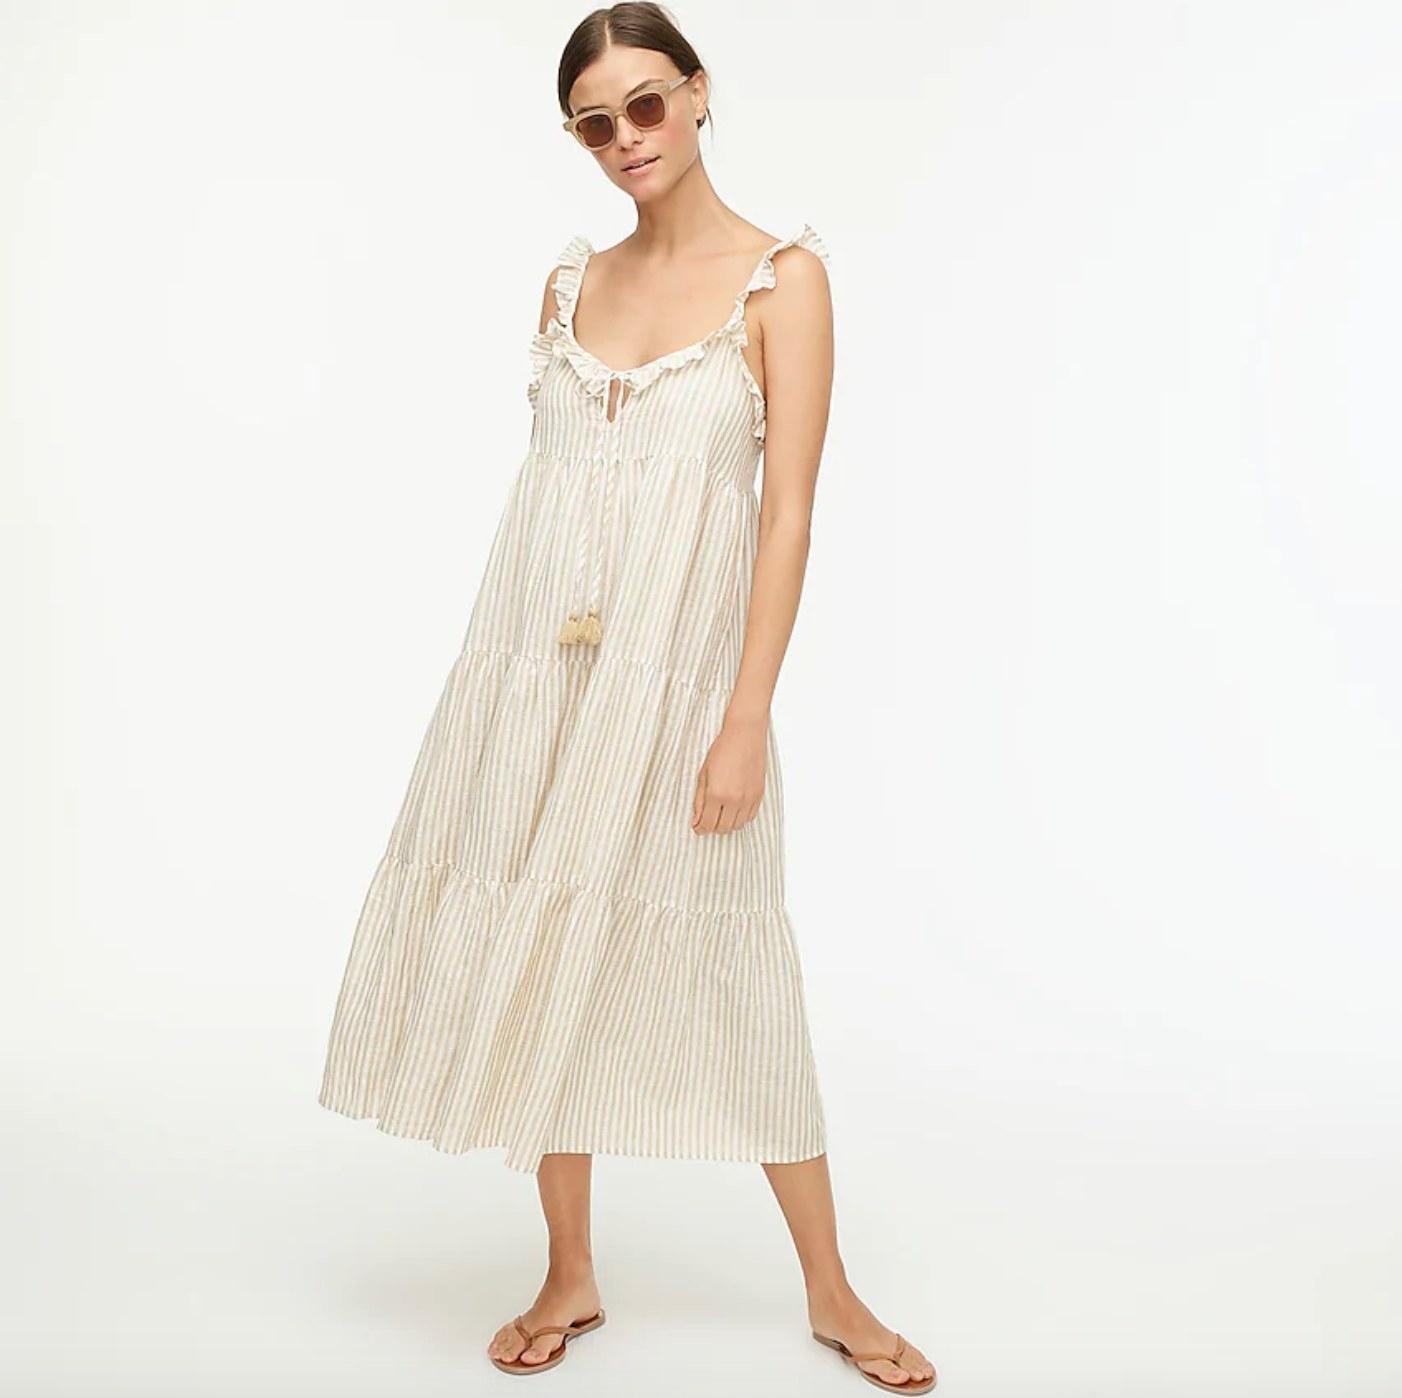 The cotton-linen tiered maxi dress in golden mushroom